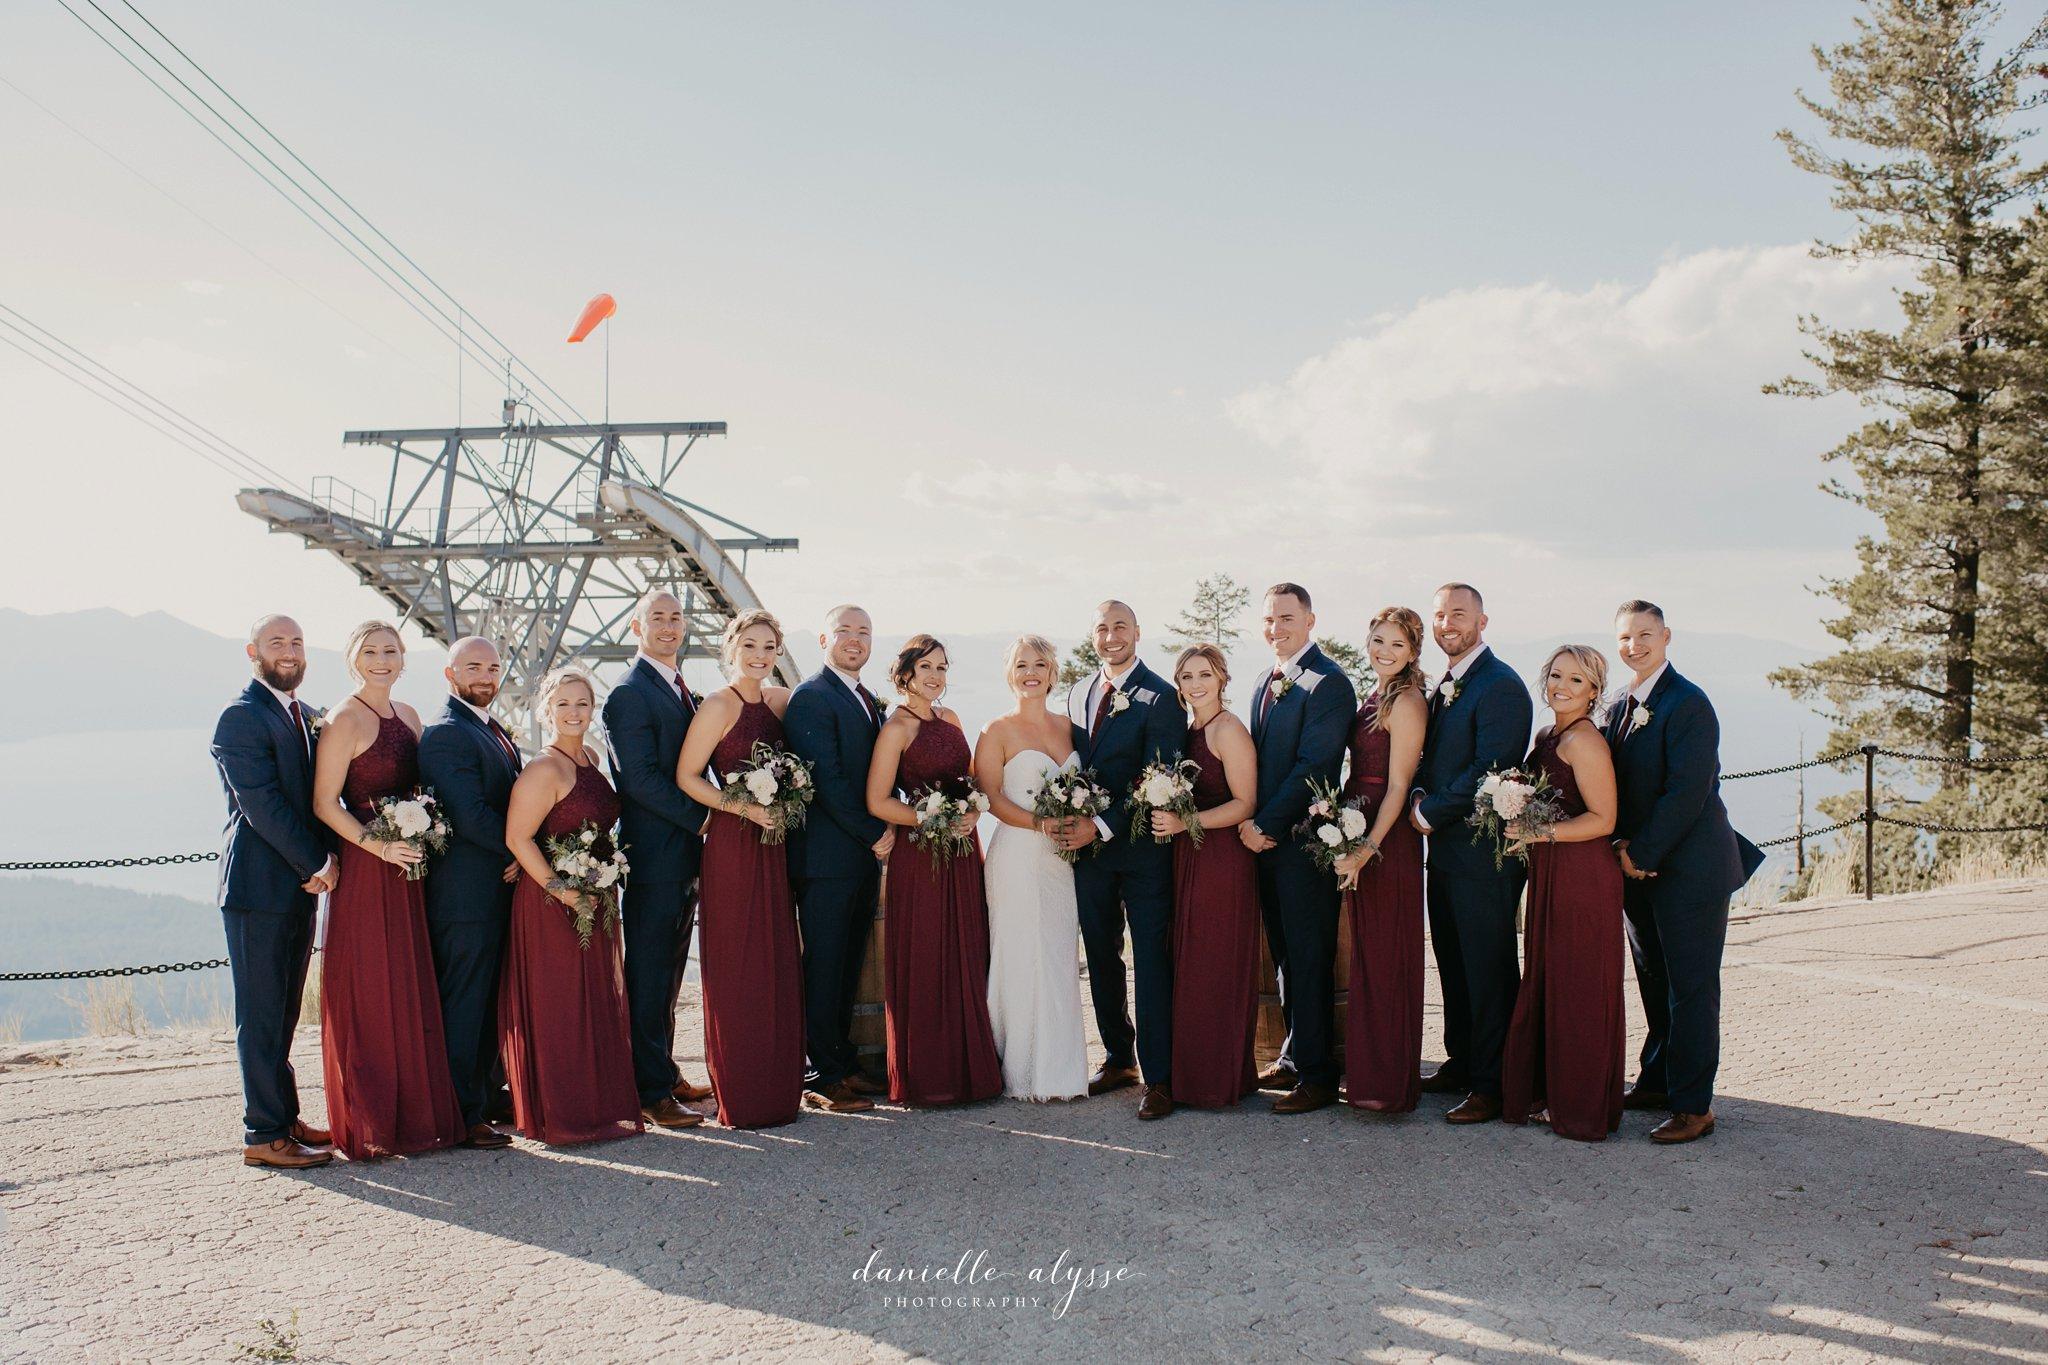 180831_wedding_stephanie_heavenly_south_lake_tahoe_danielle_alysse_photography_destination_blog_802_WEB.jpg